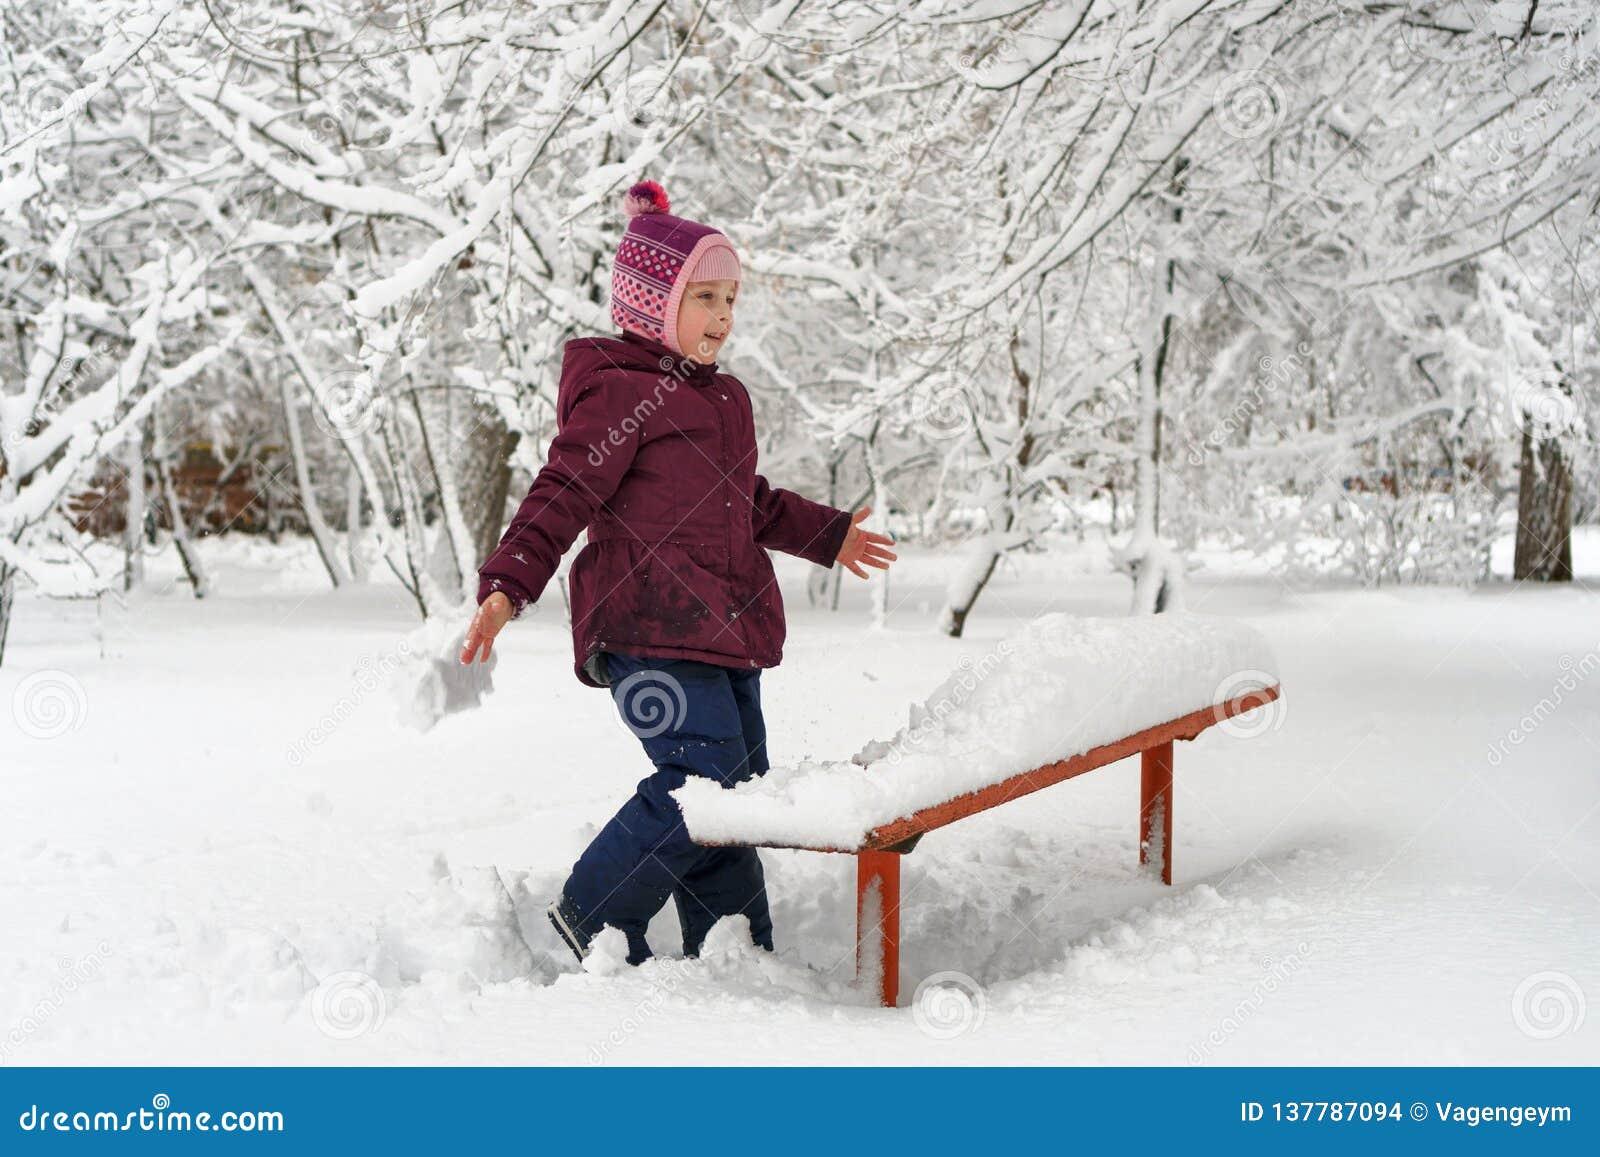 Little girl in winter outdoors